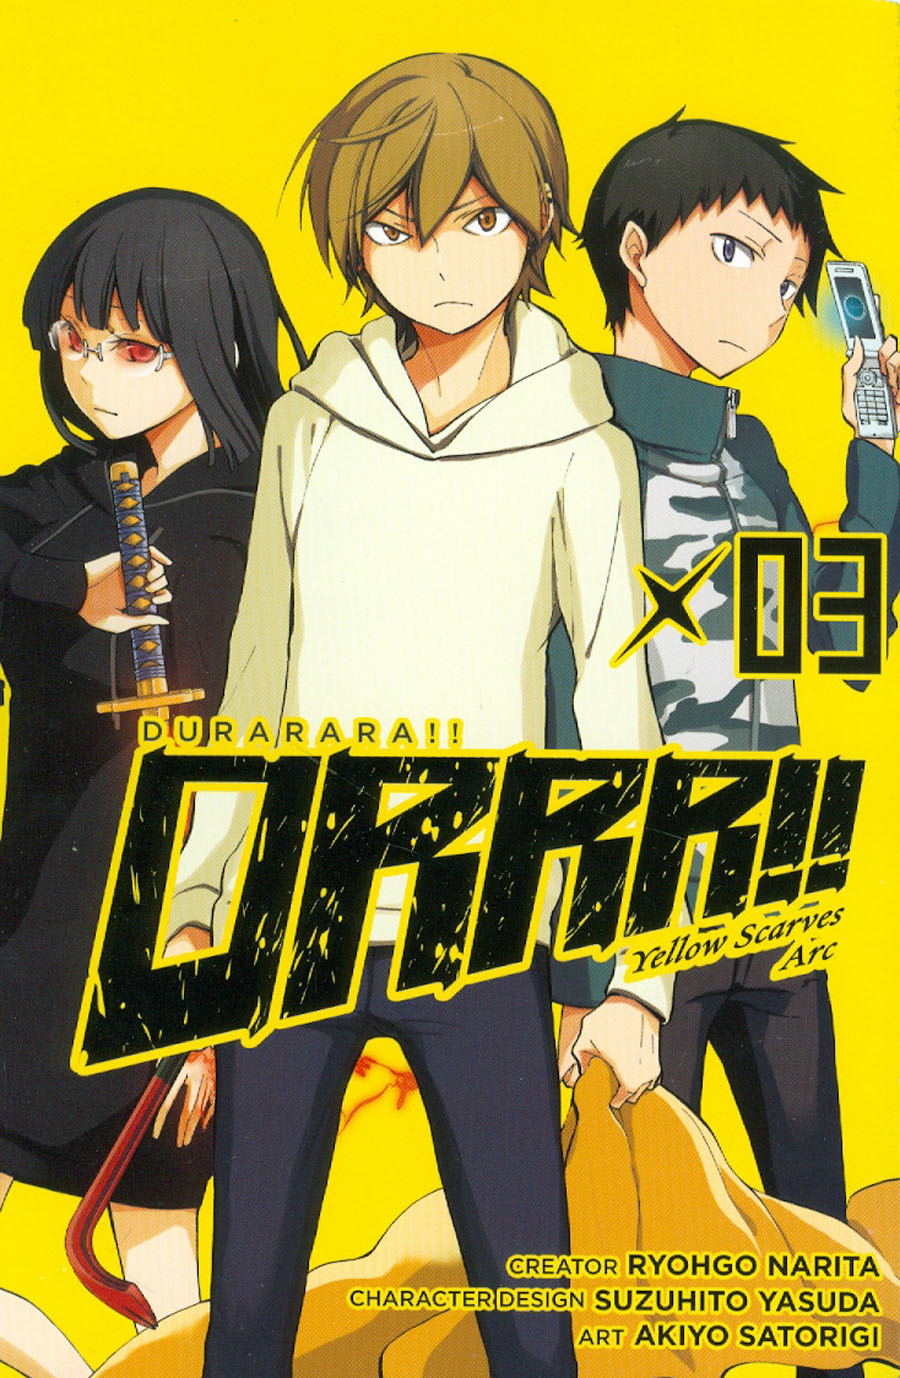 Durarara Yellow Scarves Arc Vol 3 TP